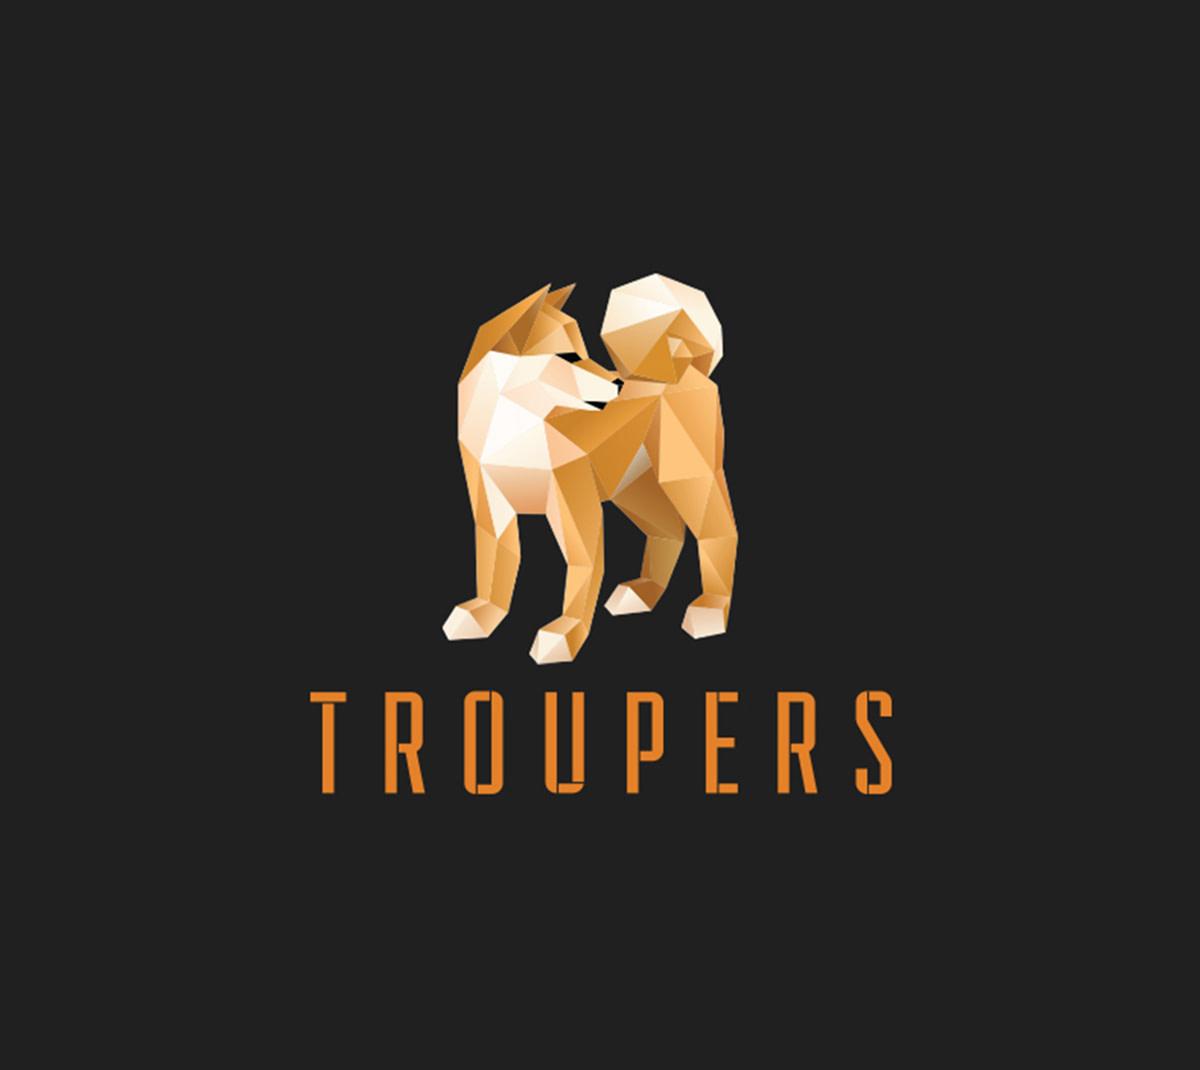 Troupers-web-logo-3